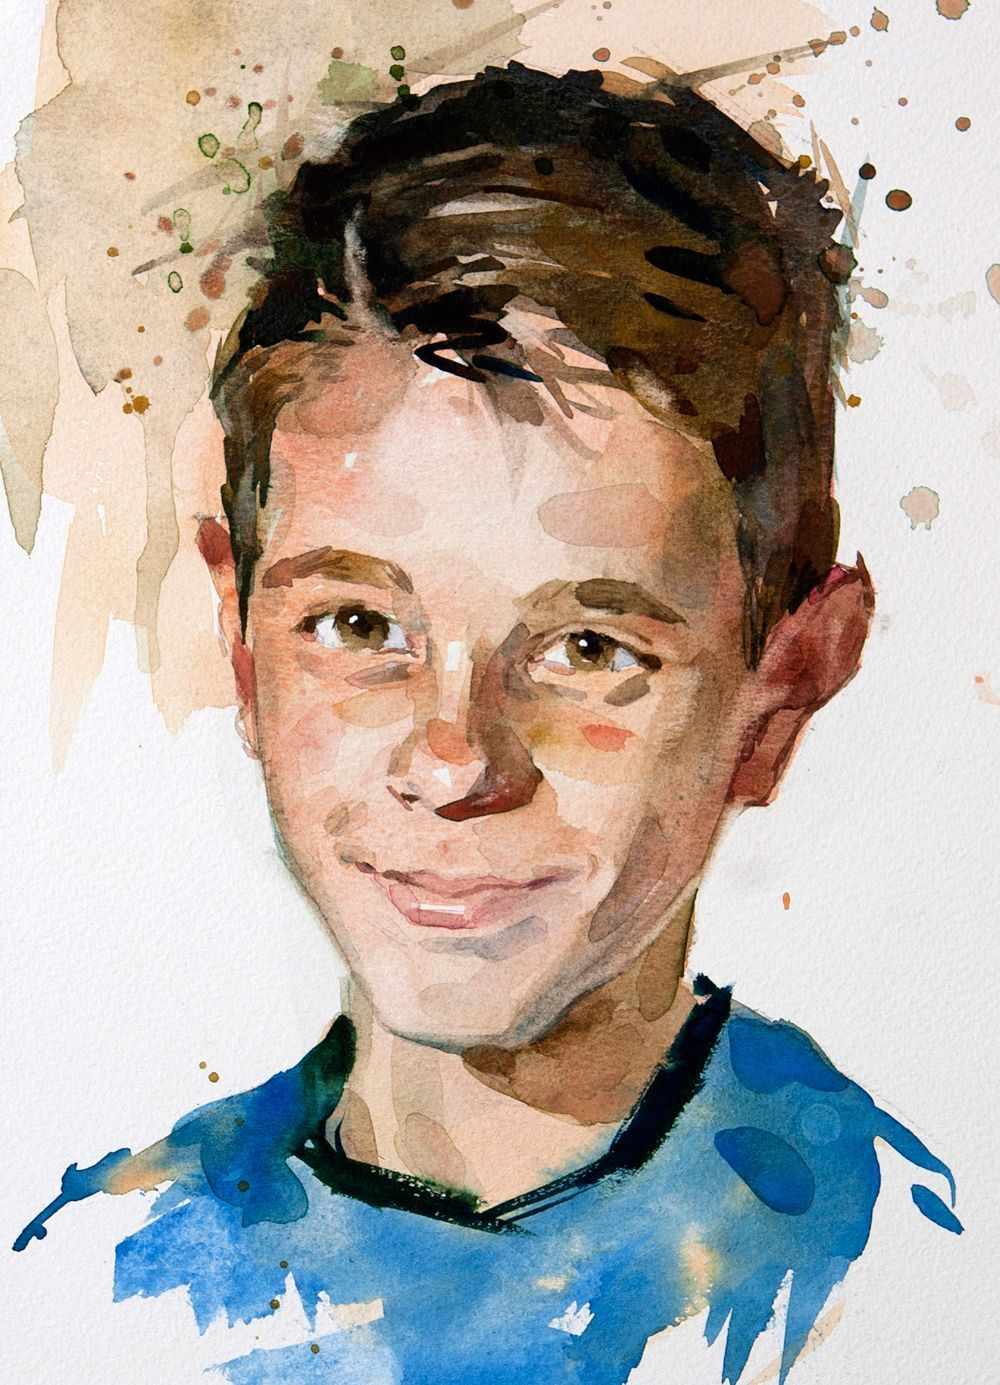 Painting A Portrait In Watercolour Ben Lustenhouwer